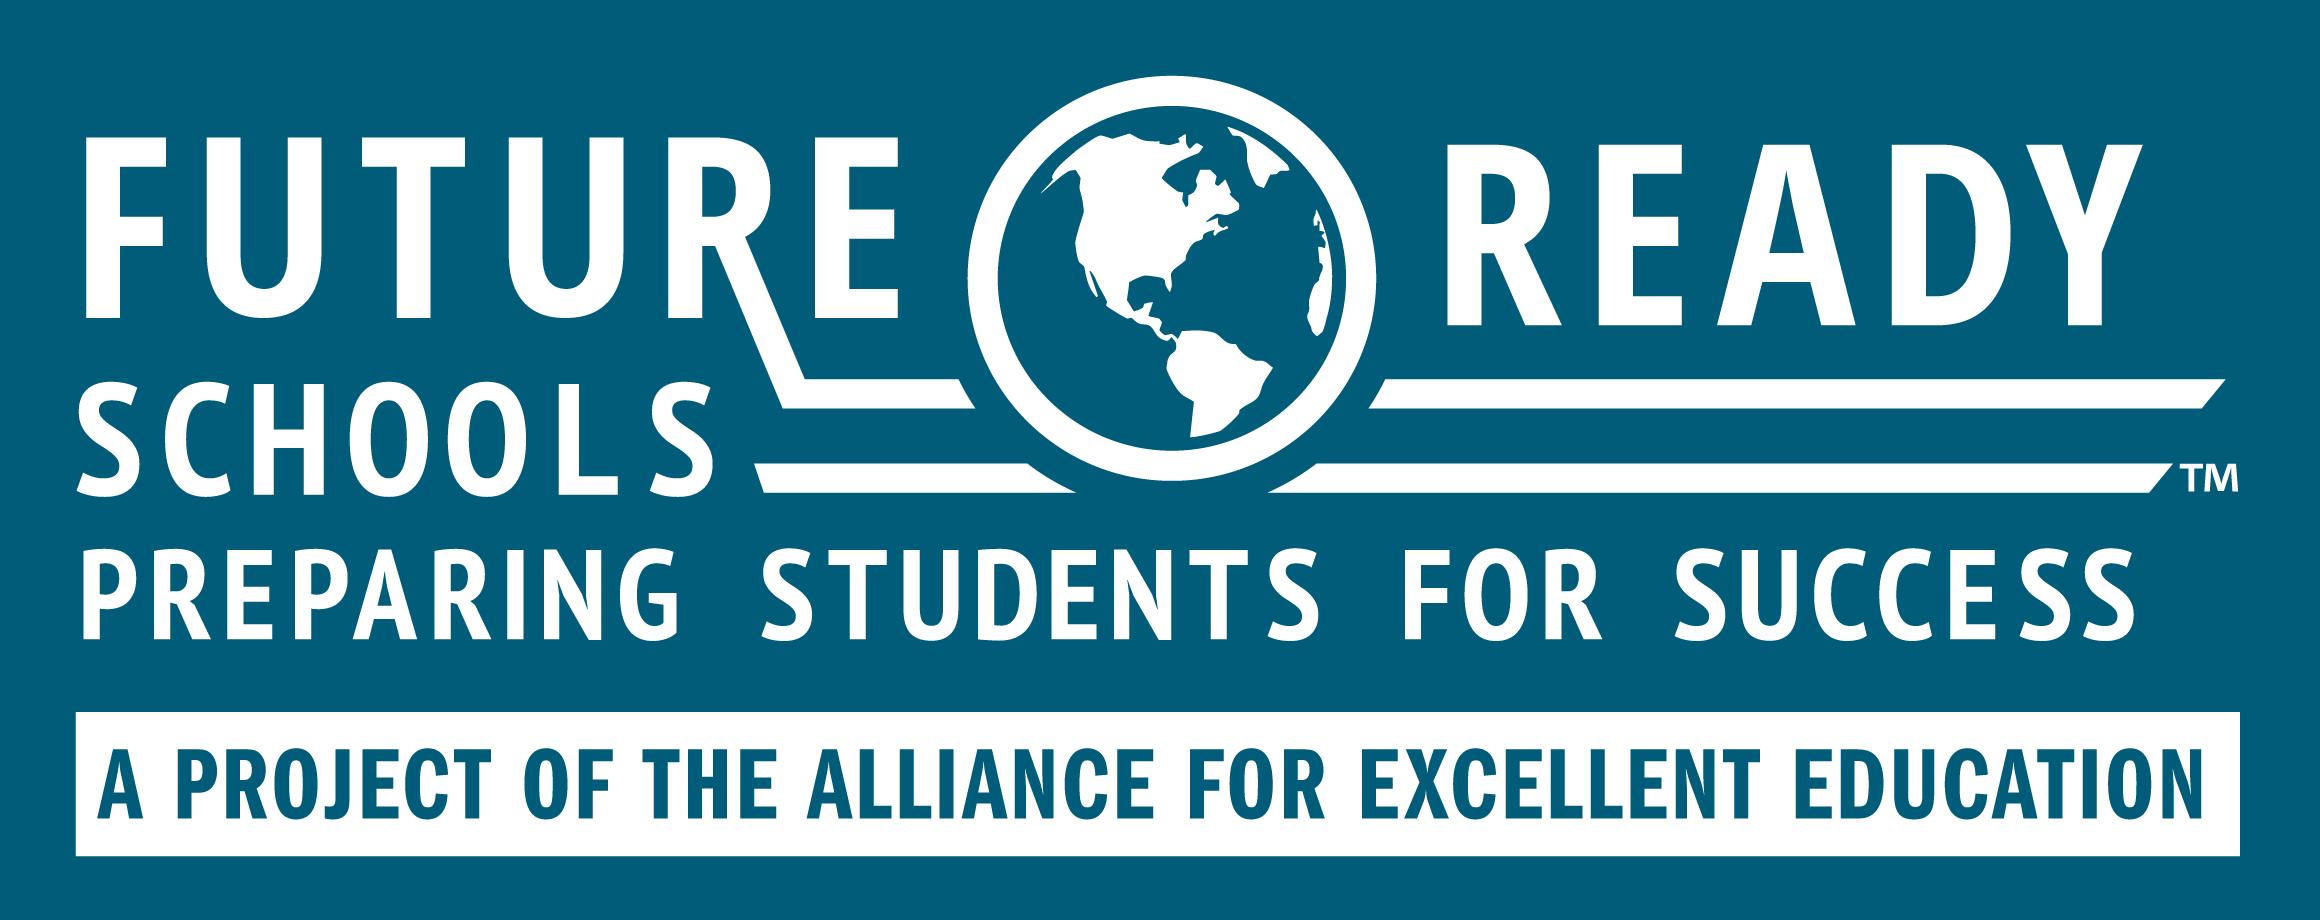 Future Ready Schools Logo